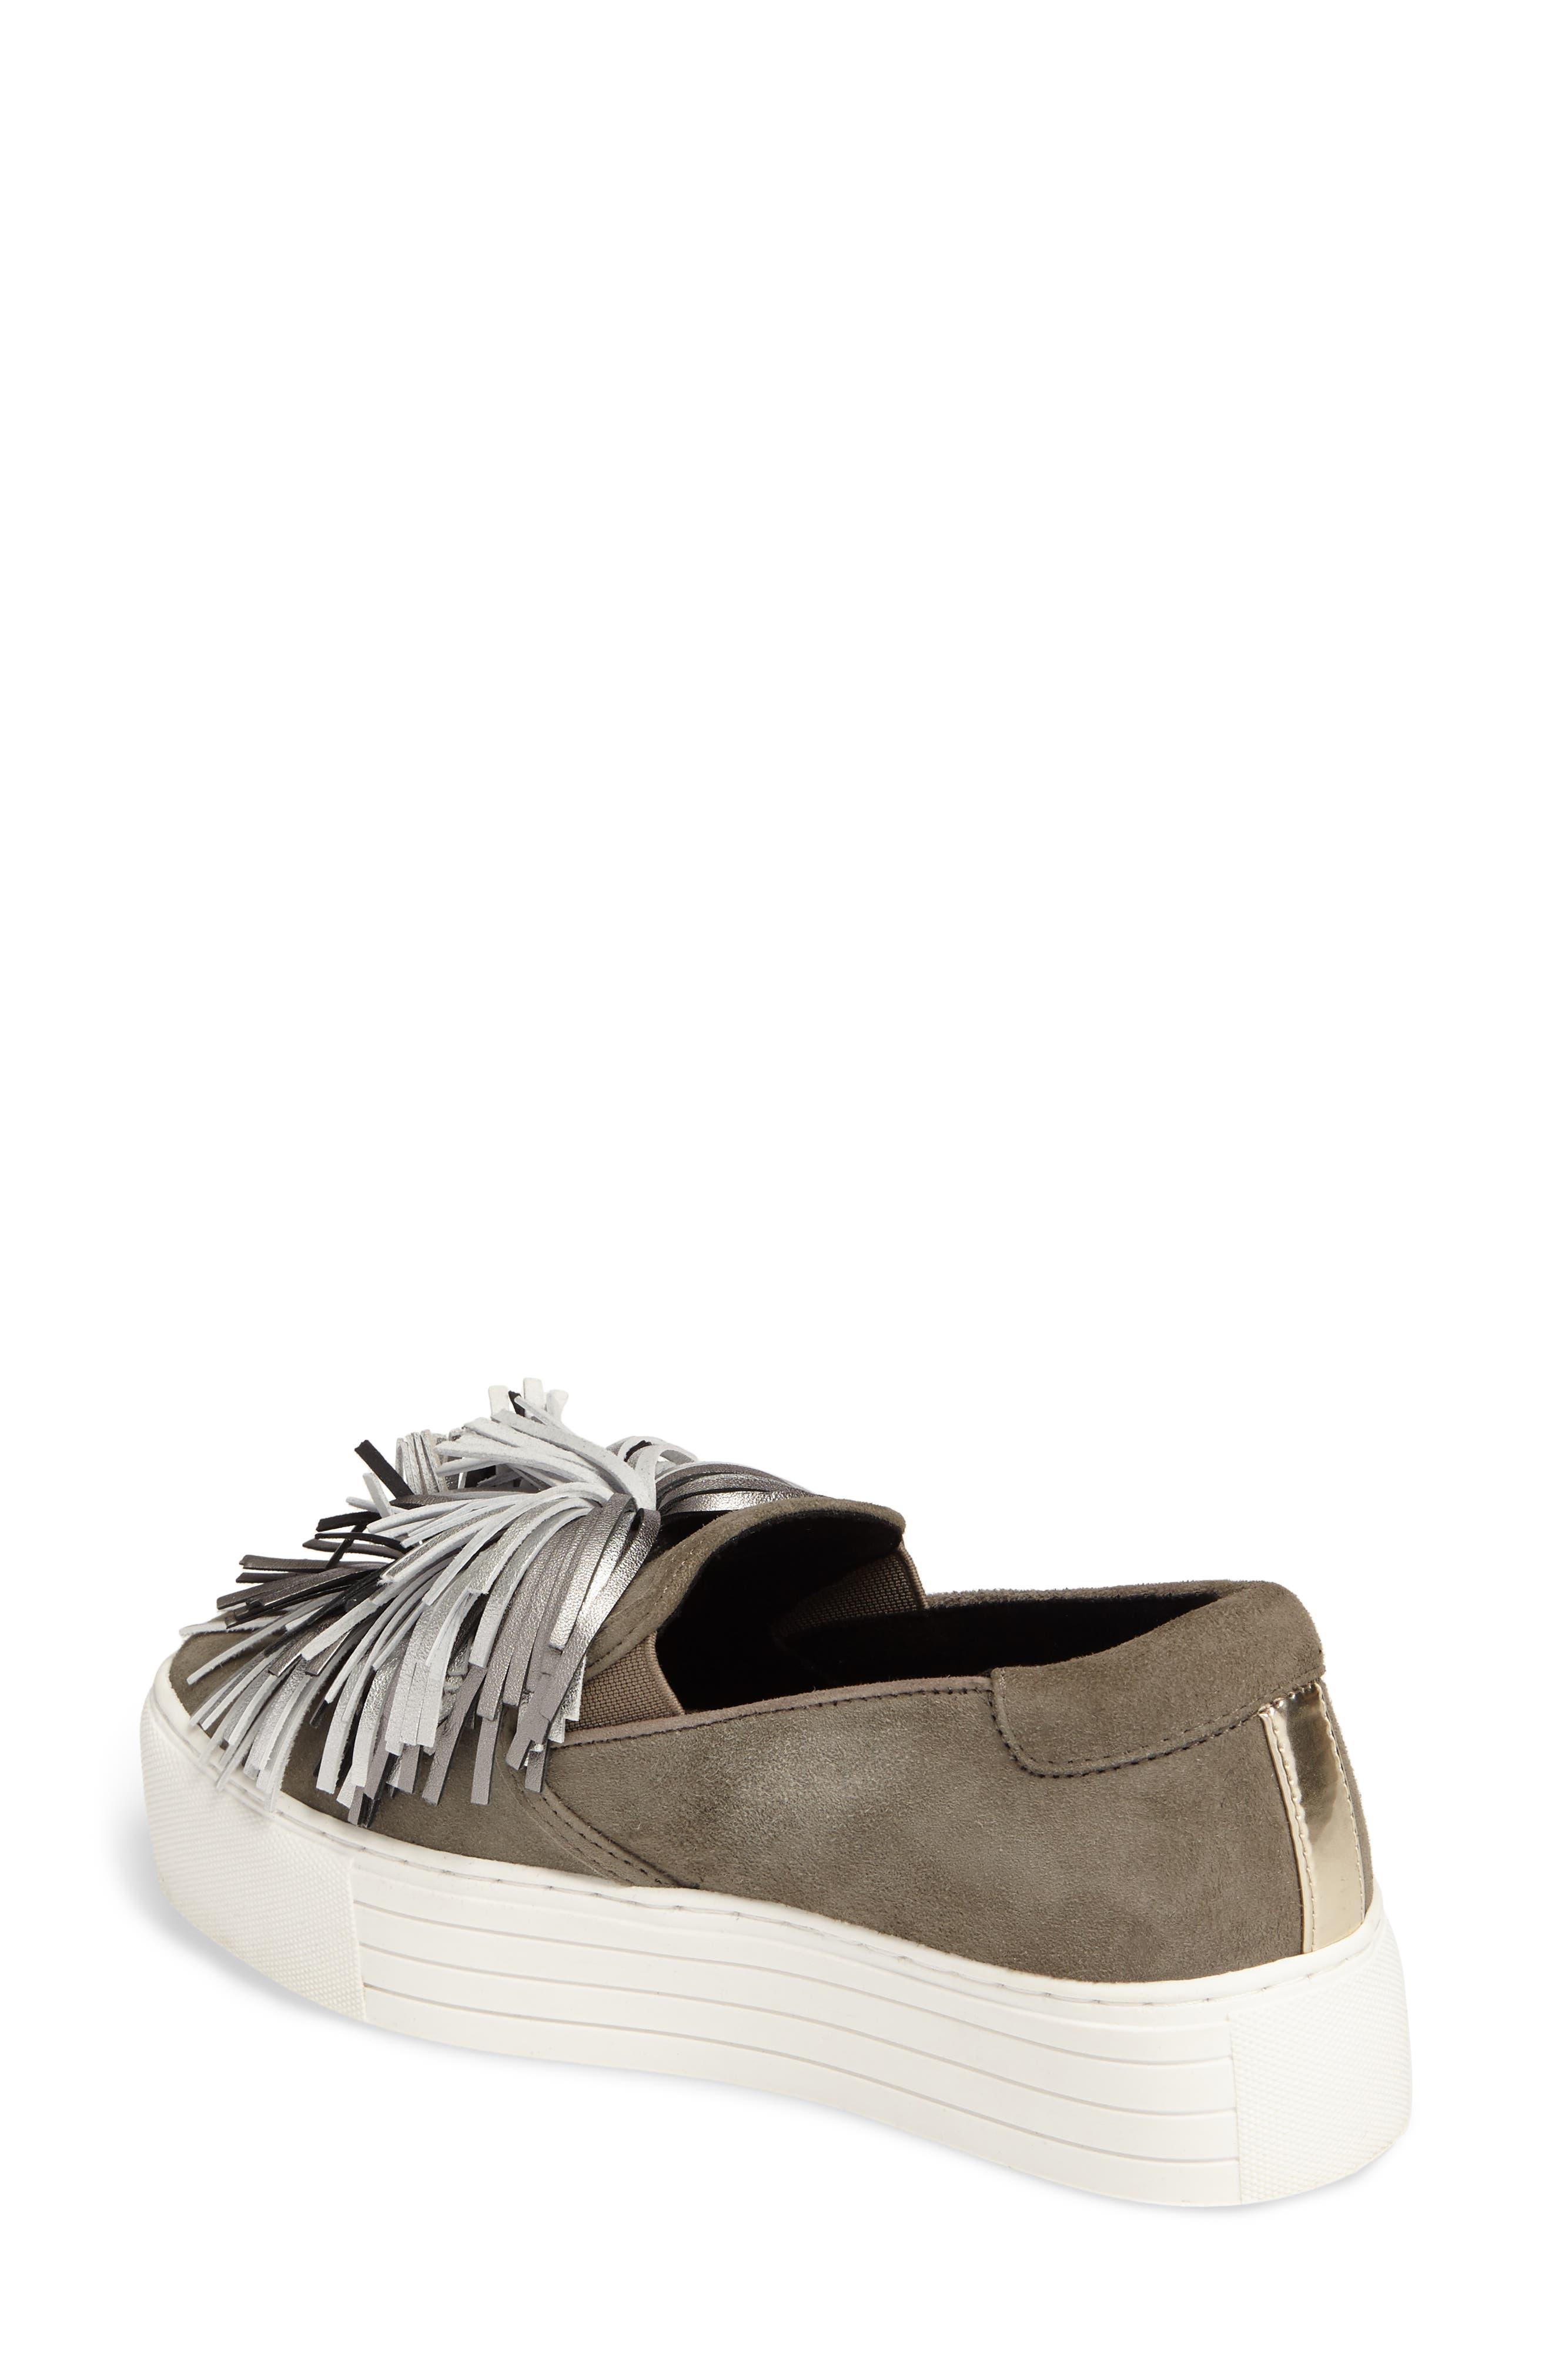 Jayson Pom Platform Sneaker,                             Alternate thumbnail 2, color,                             090